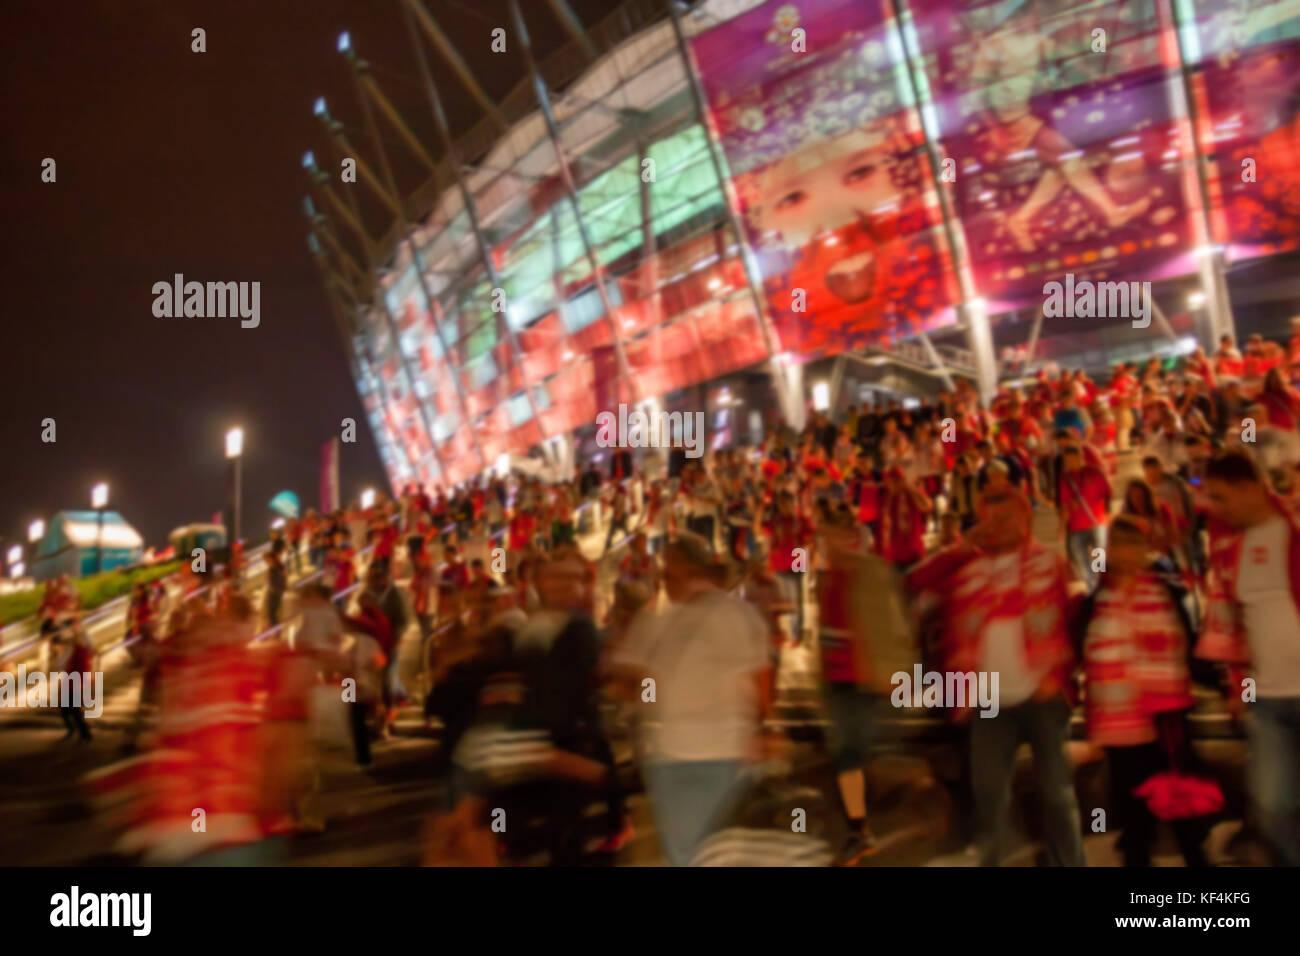 WARSAW, POLAND - JUNE 2012: Blurred view of football stadium - Stock Image